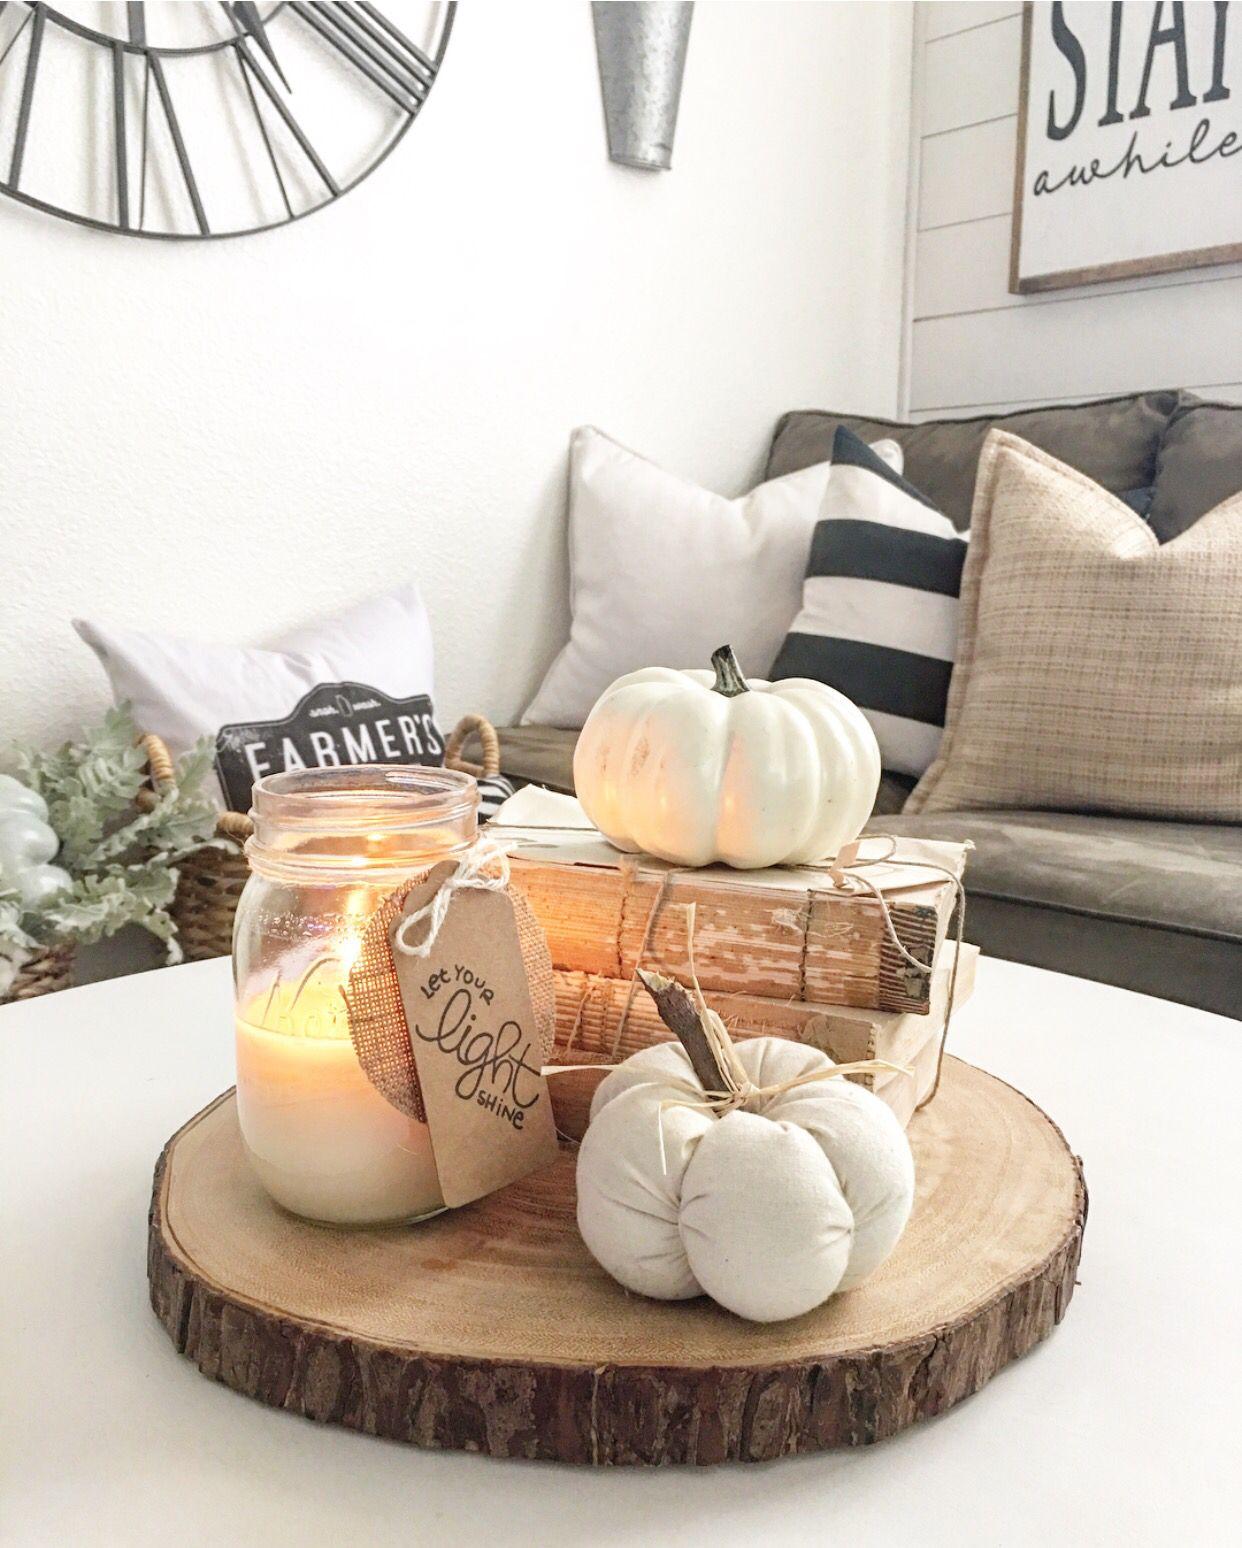 4 Simple Rustic Farmhouse Living Room Decor Ideas